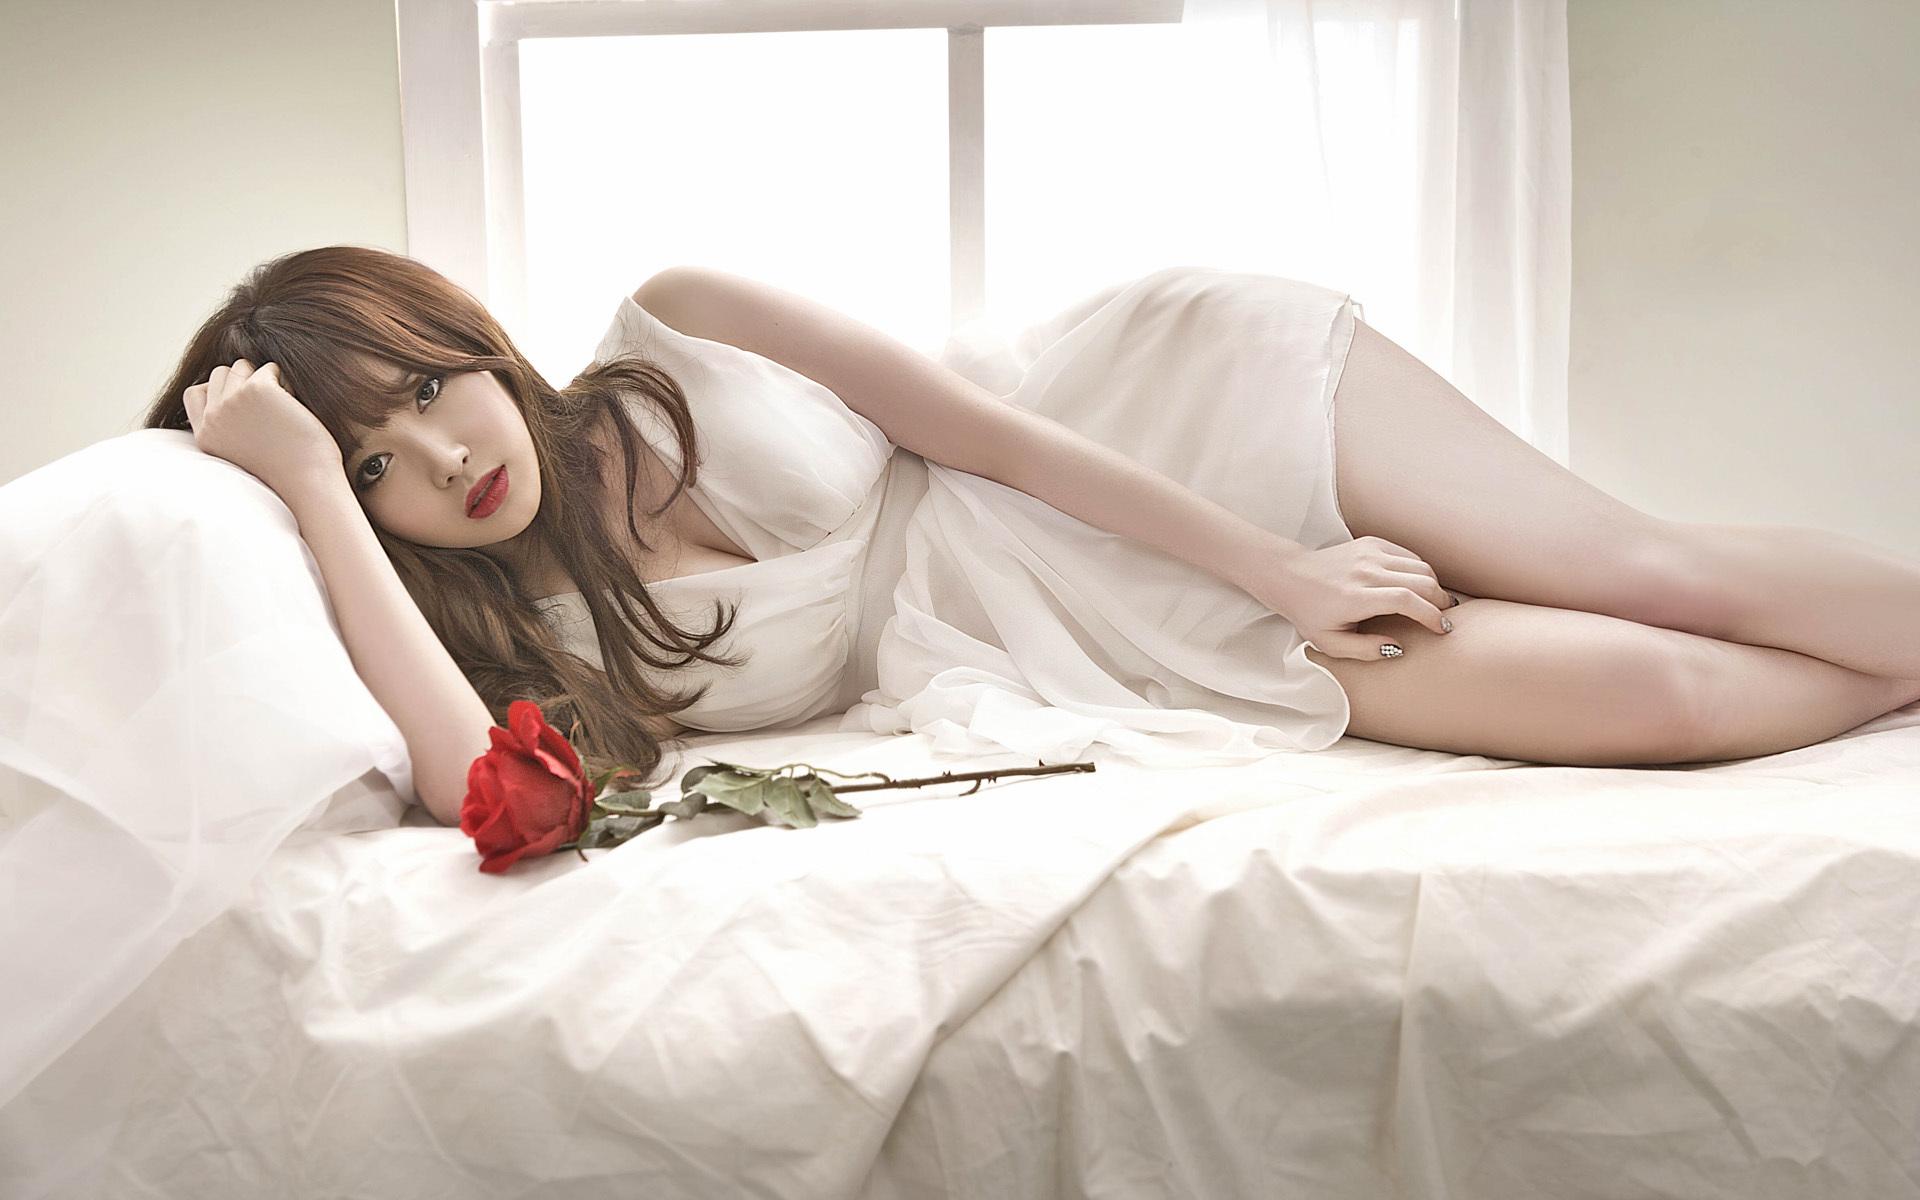 son-masturbating-korean-photo-nude